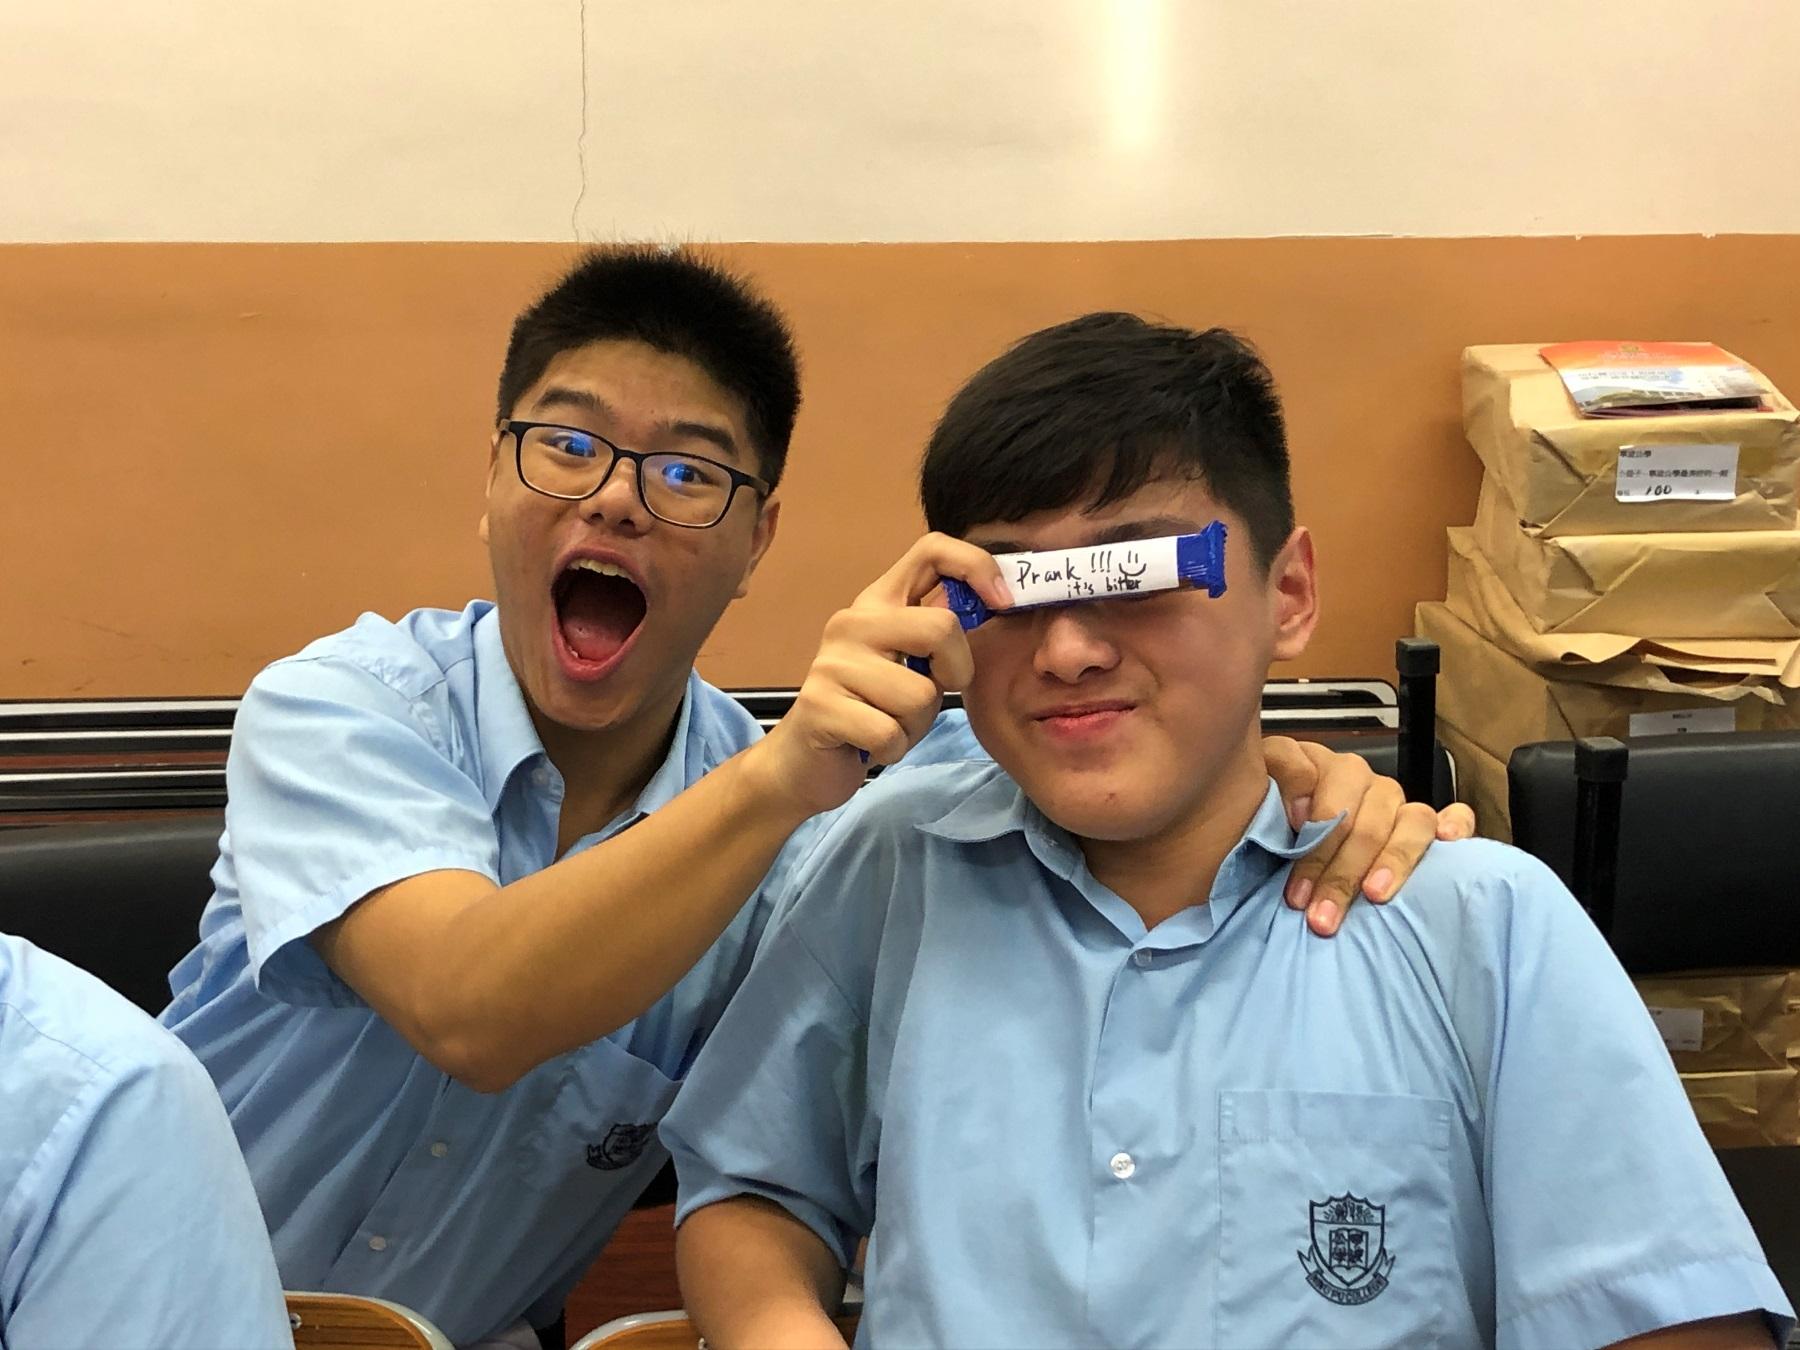 http://npc.edu.hk/sites/default/files/img_1128.jpg